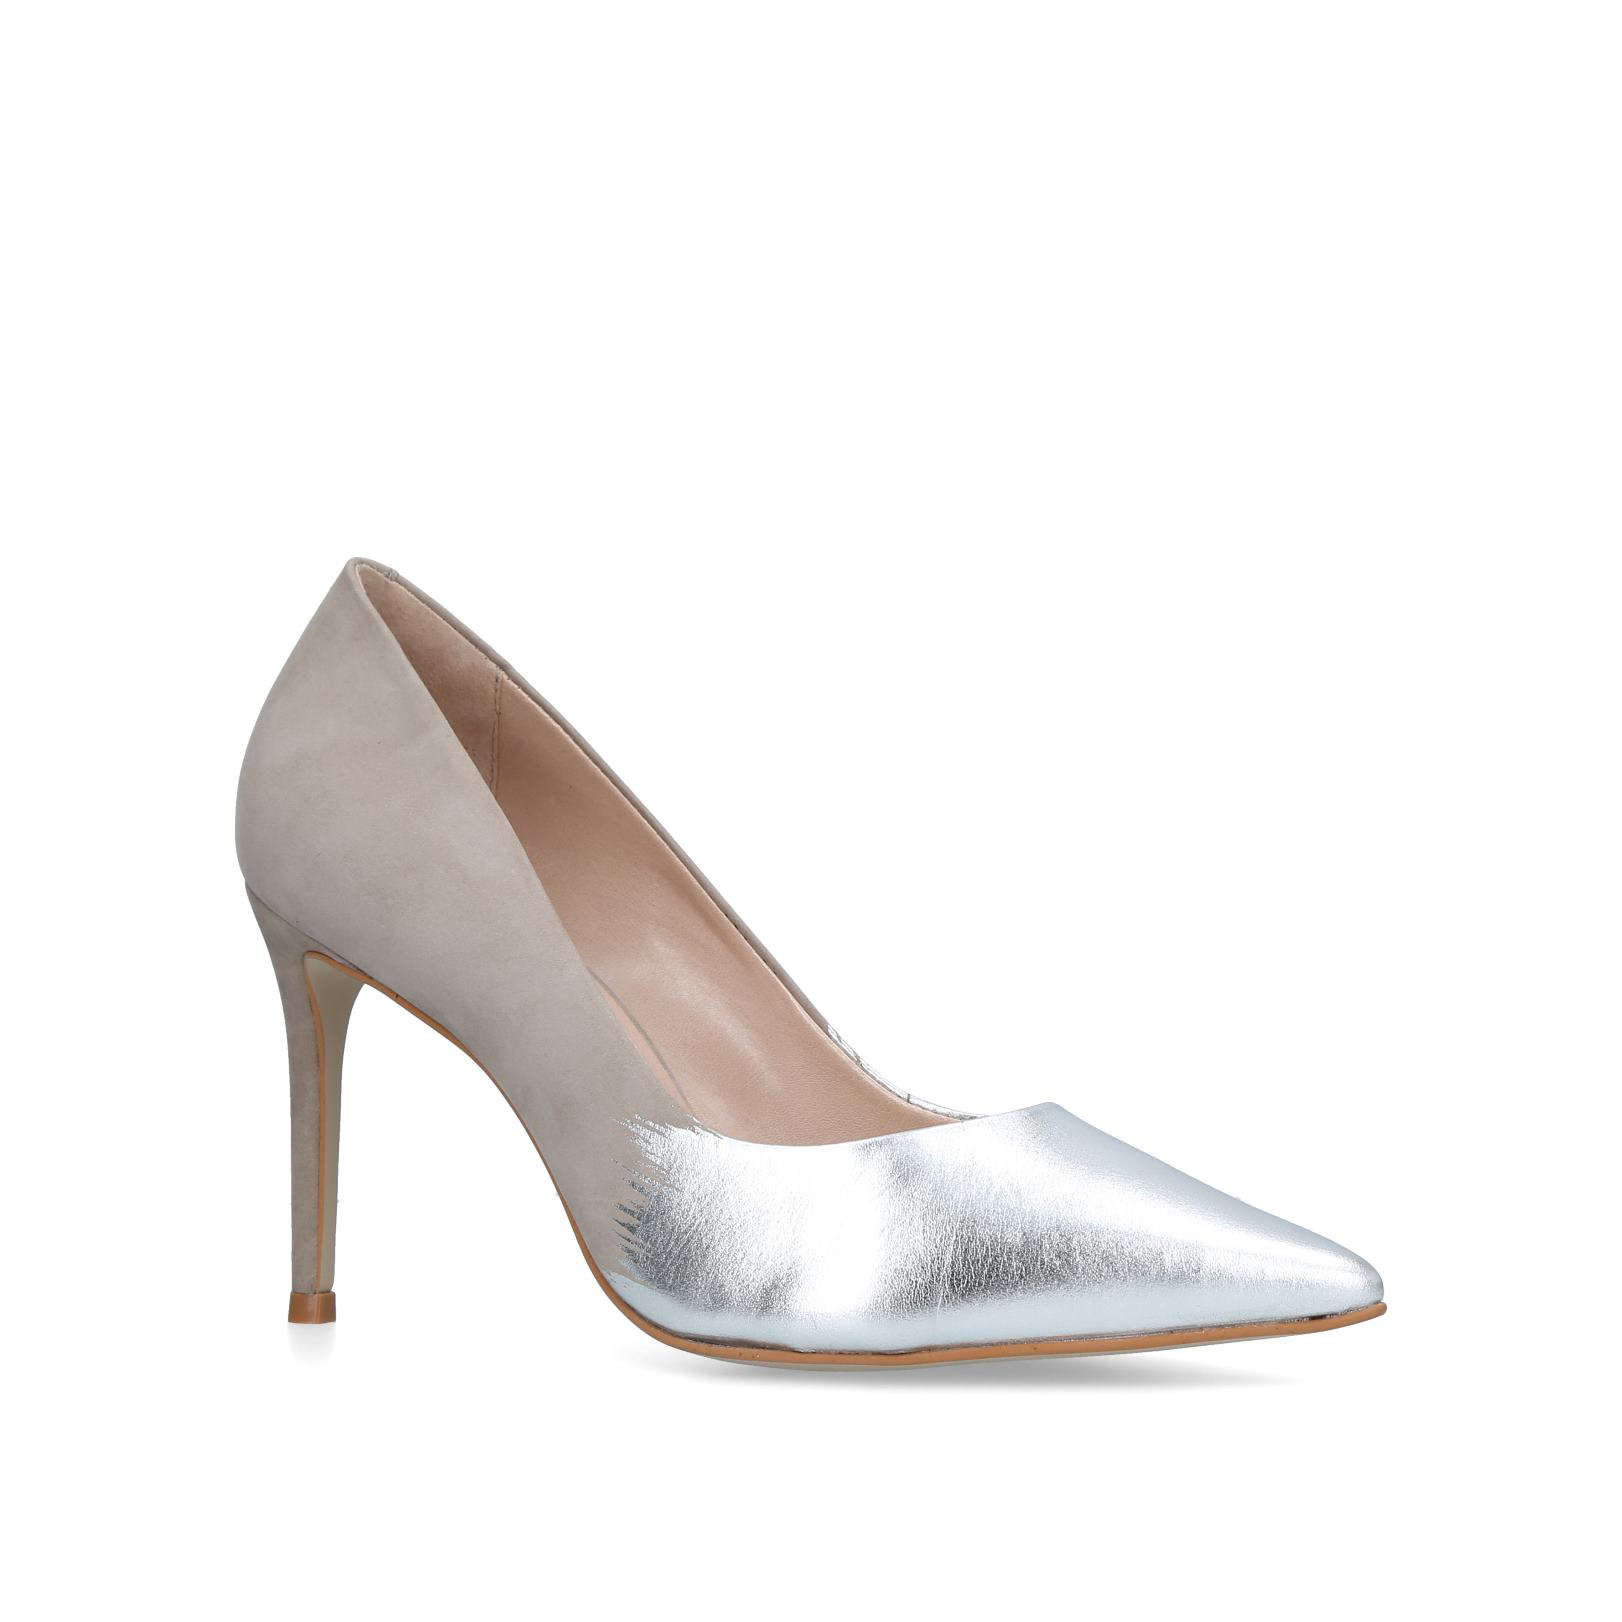 872c63f9c29 Alison Mid Heel Court Shoes